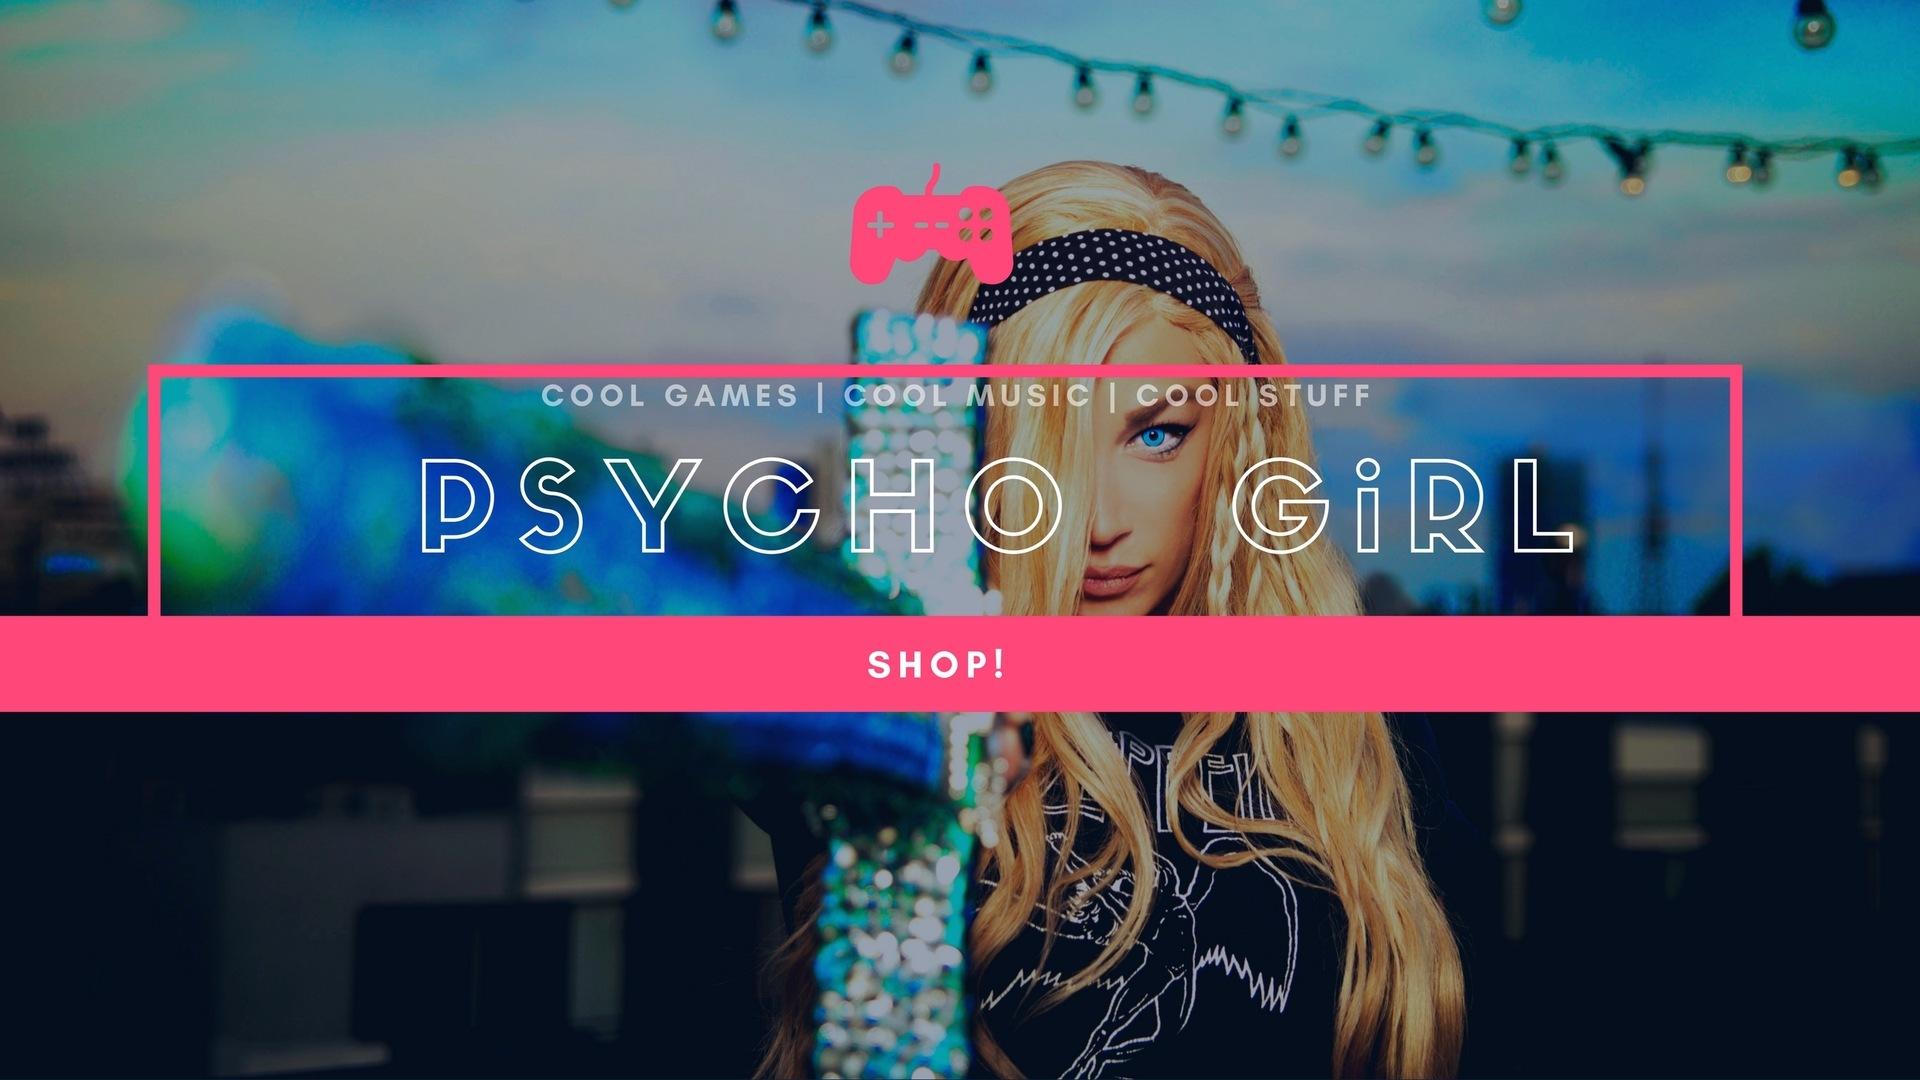 PSYCHO GiRL MERCH Store